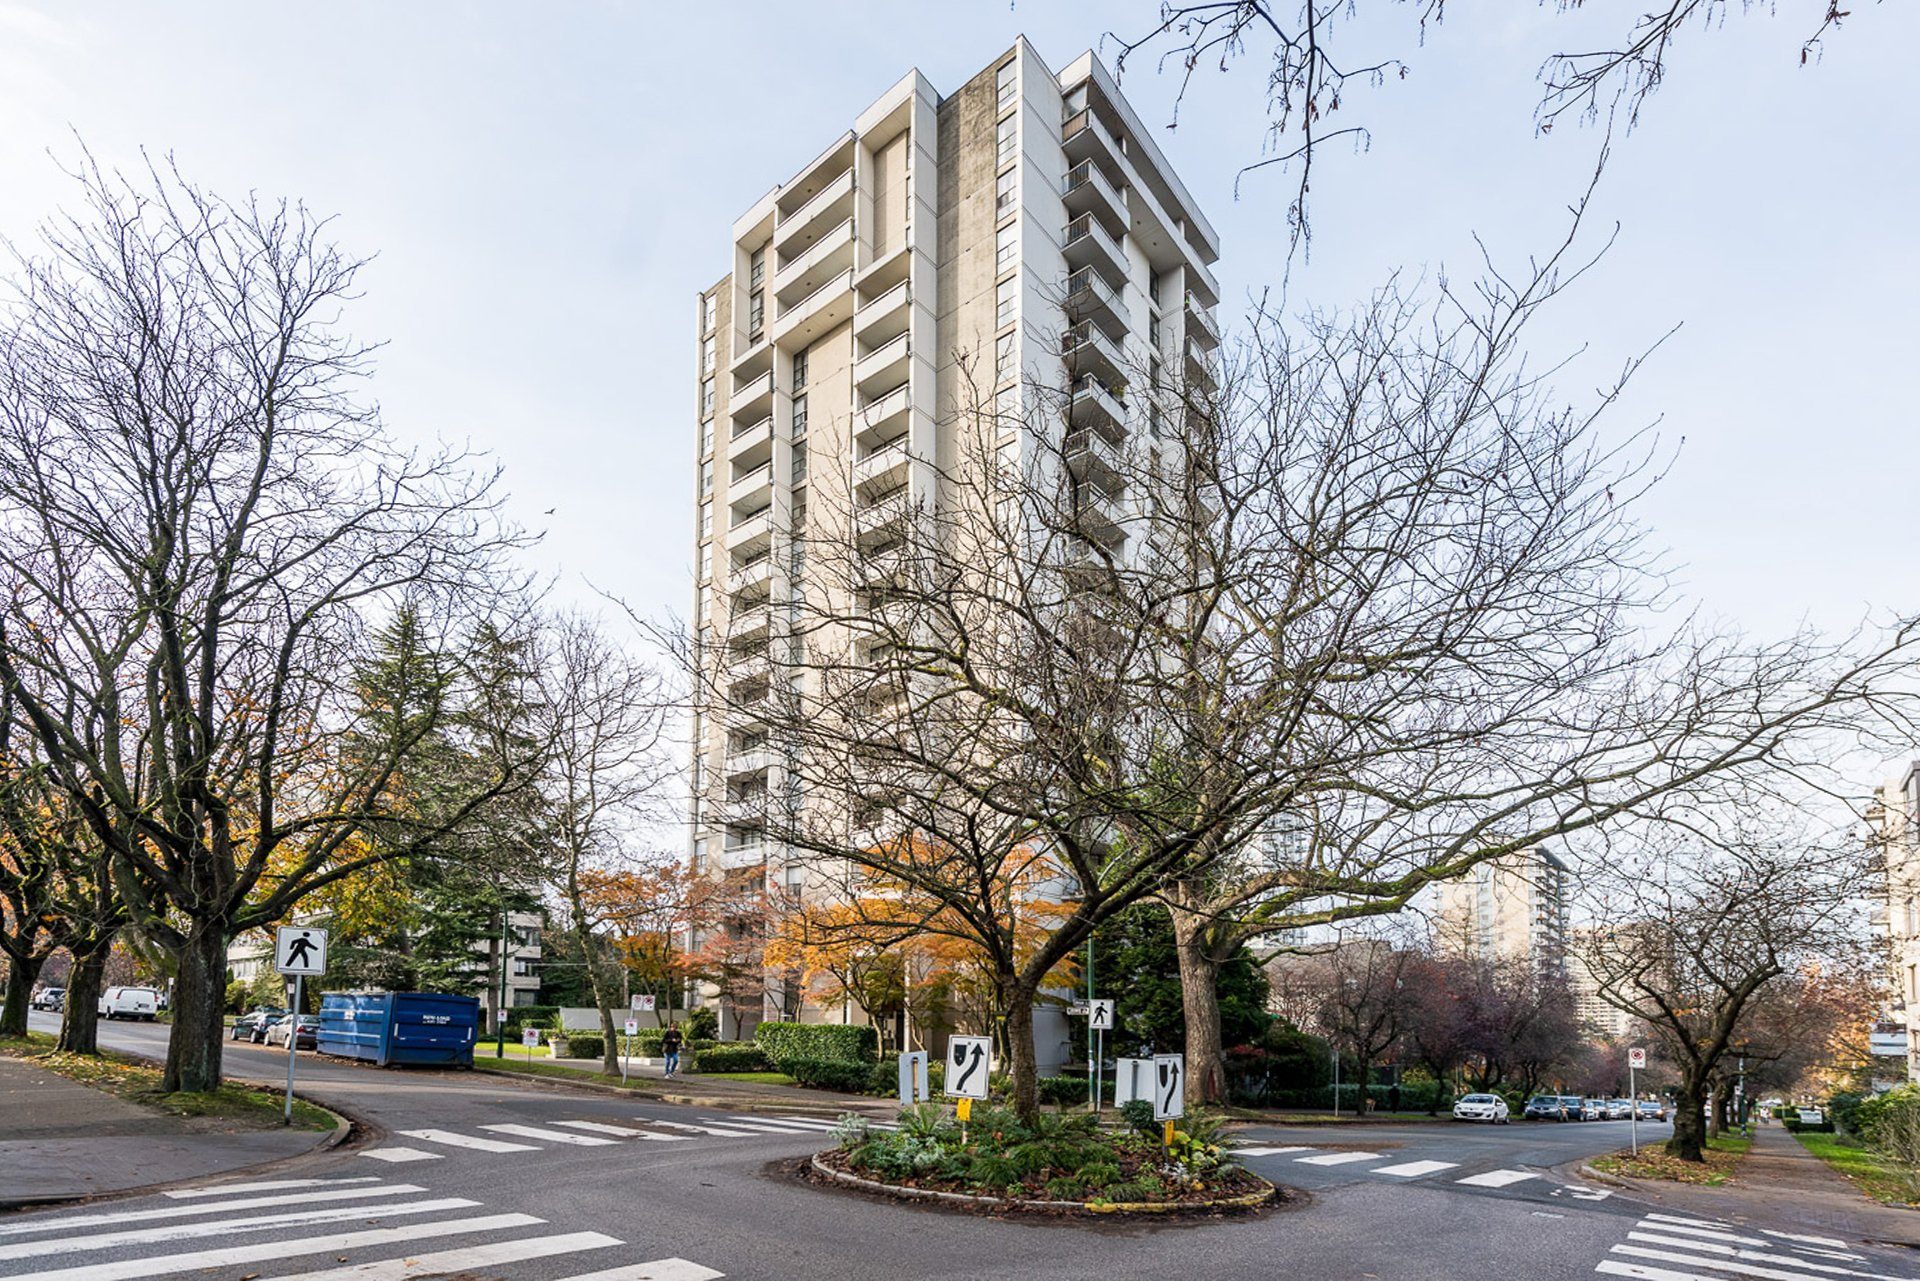 1005 Jervis St, Vancouver, BC - $2,960